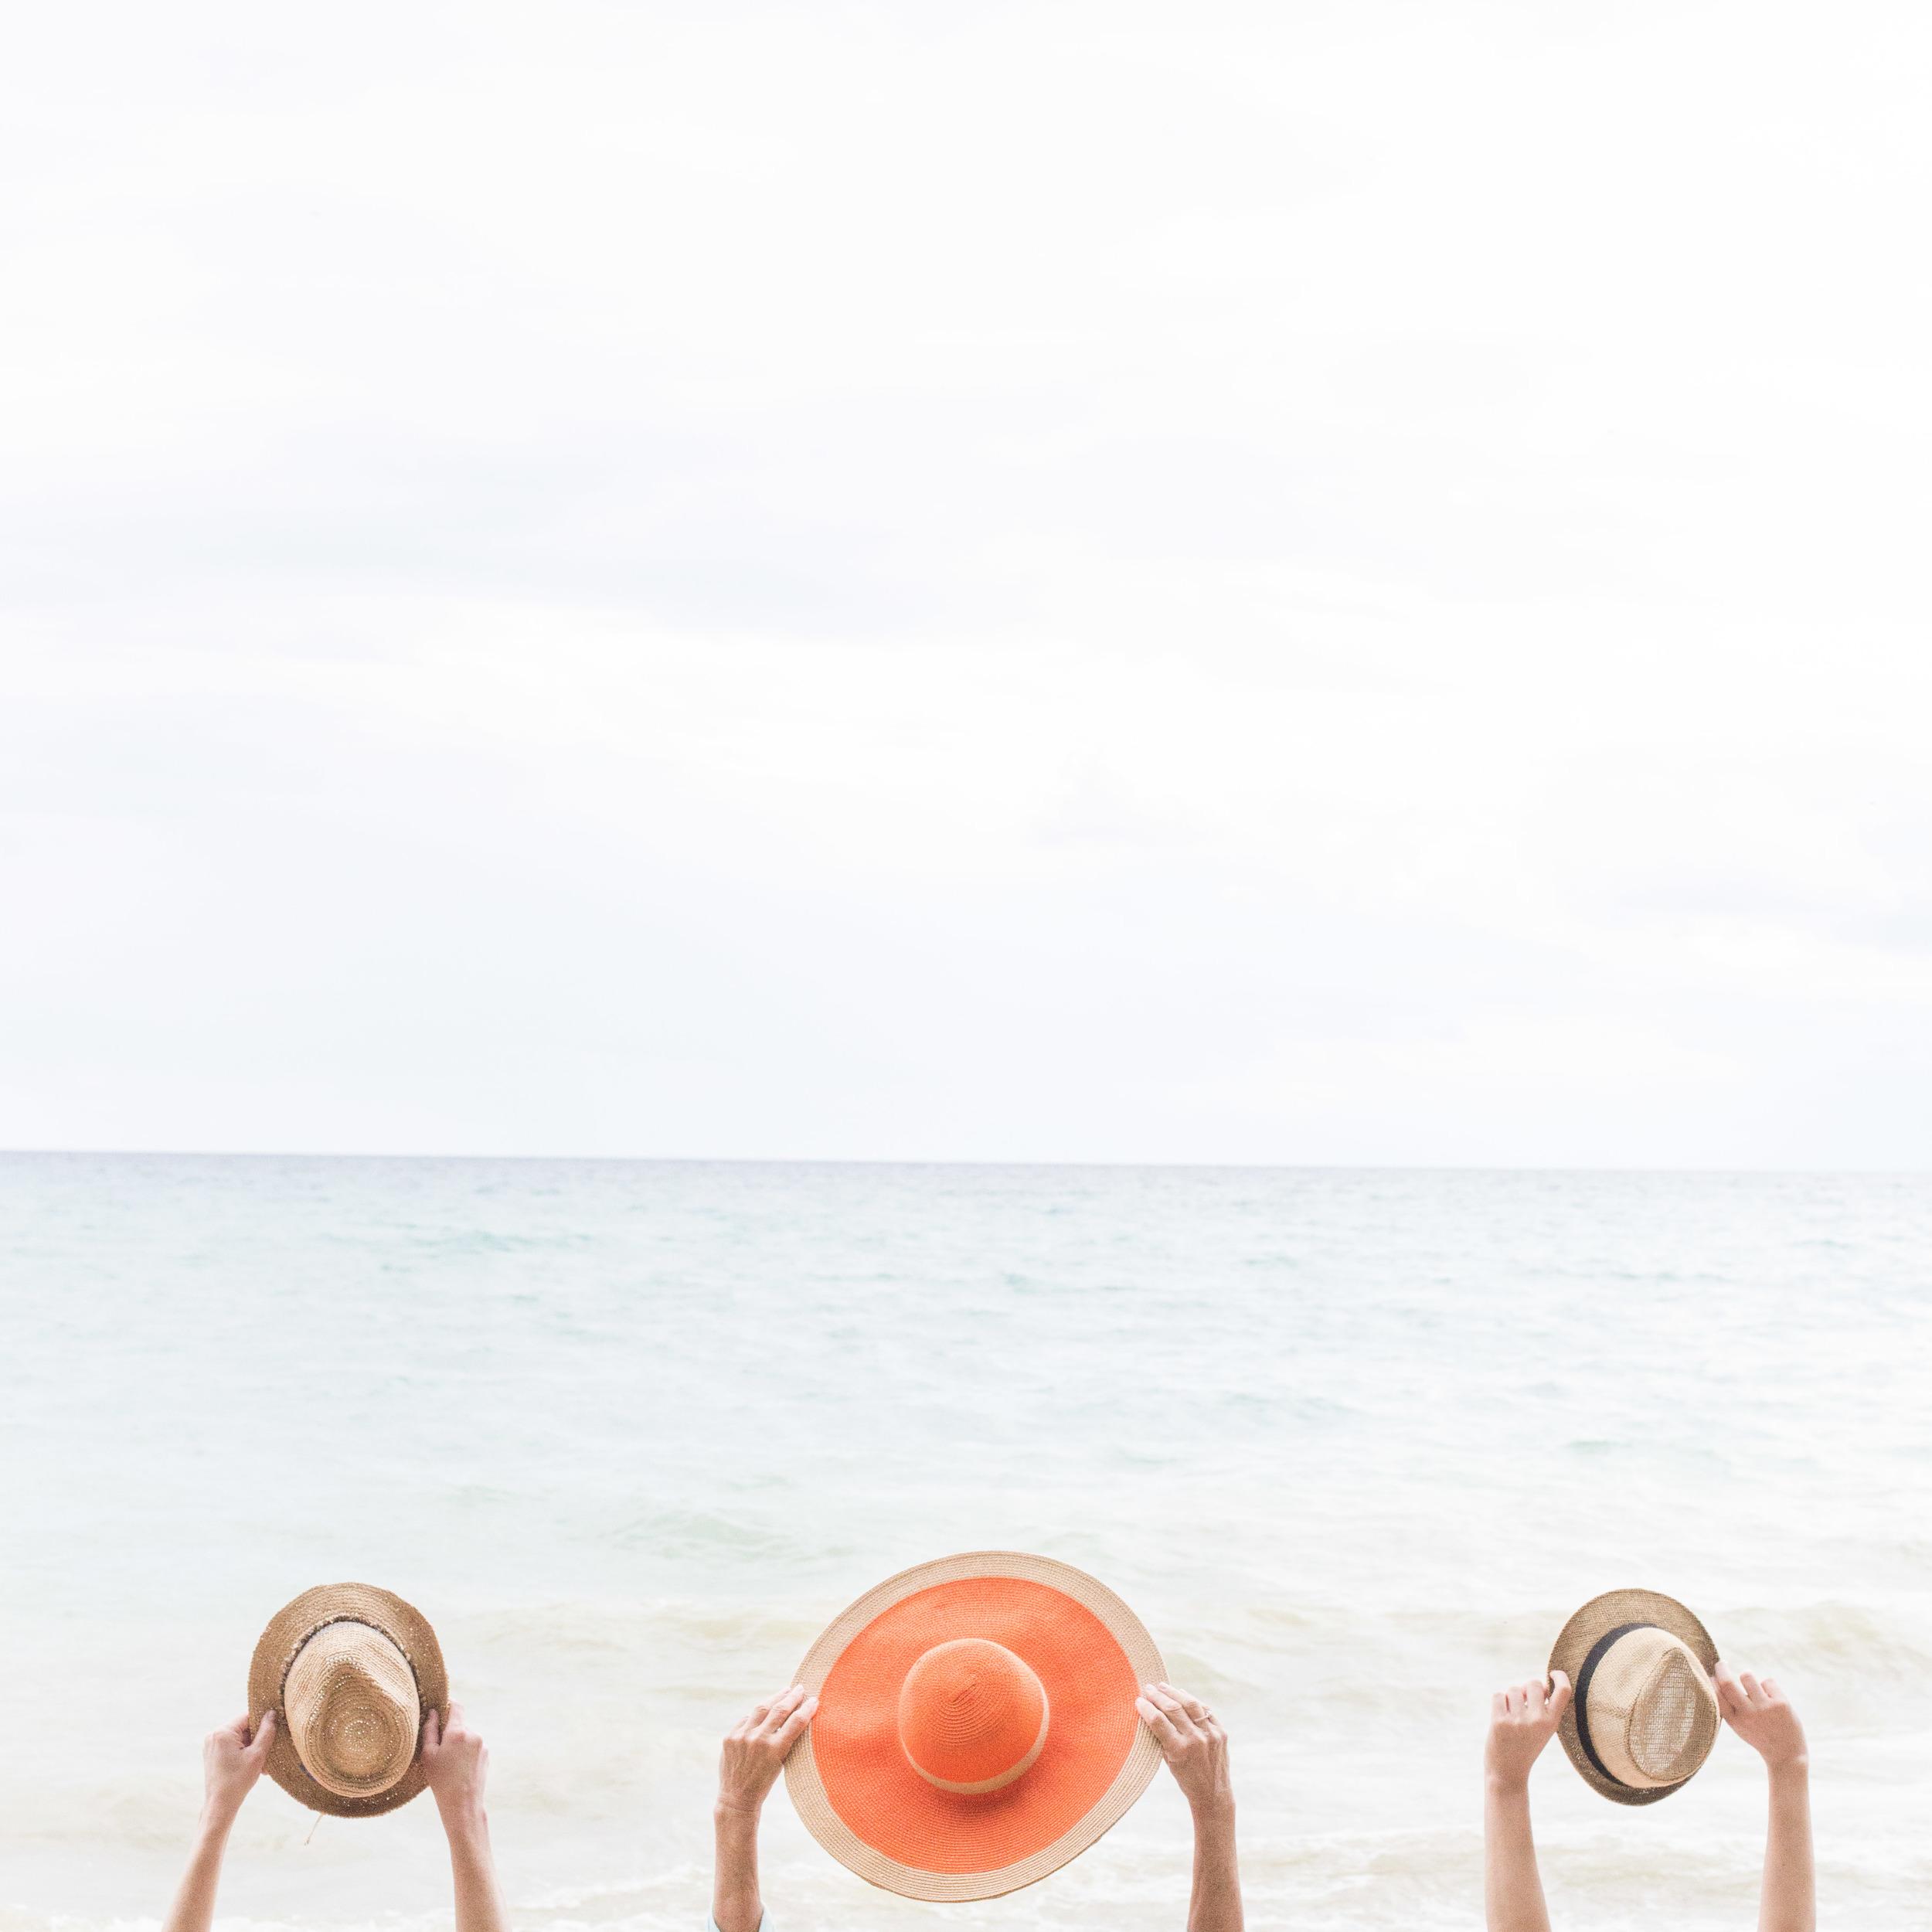 Stef_Etow_hats_beach.JPG